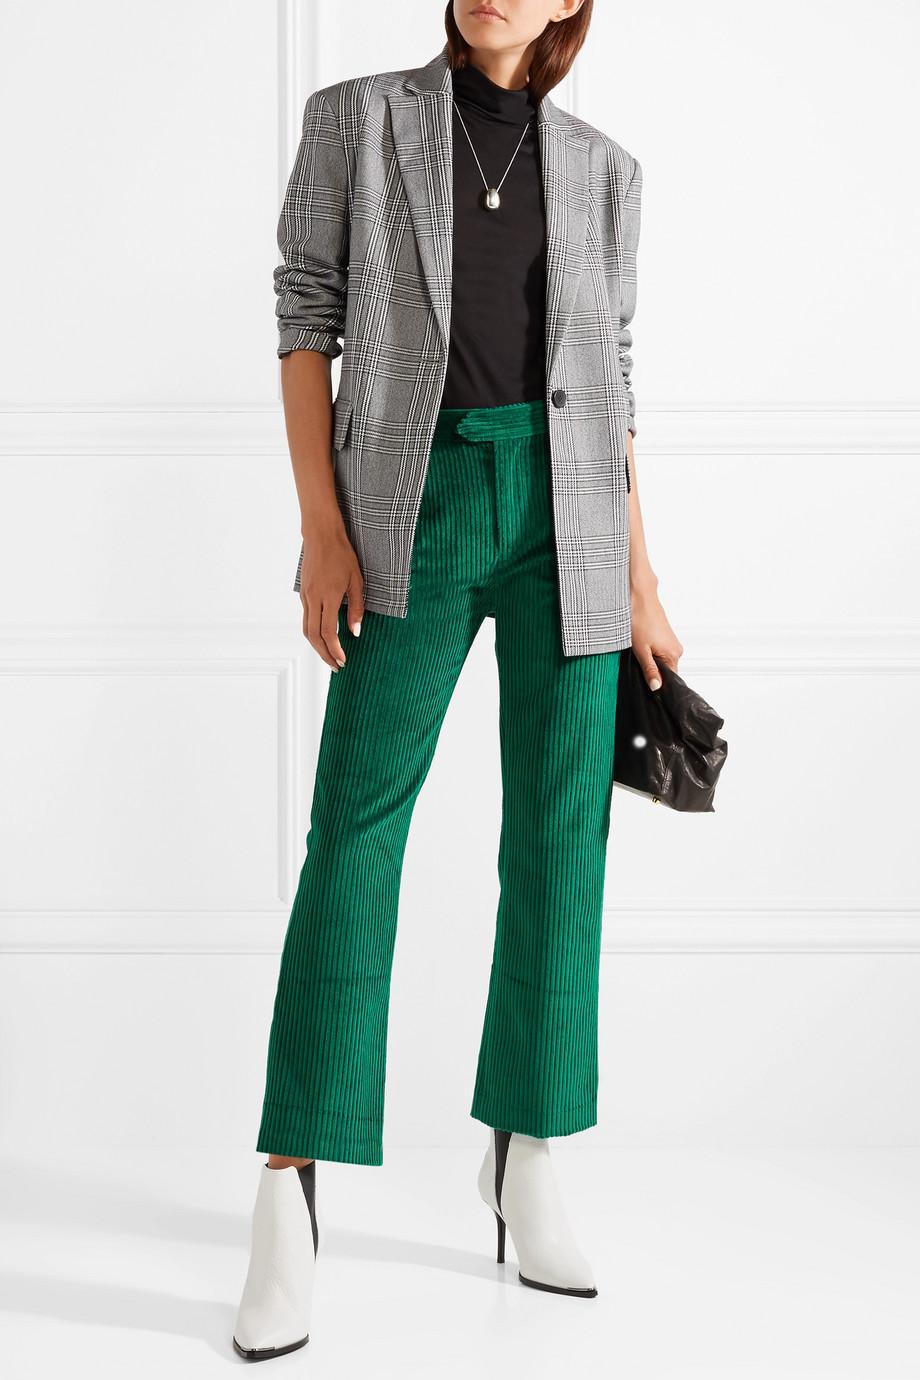 Isabel Marant Mereo cotton-corduroy straight-leg pants $425